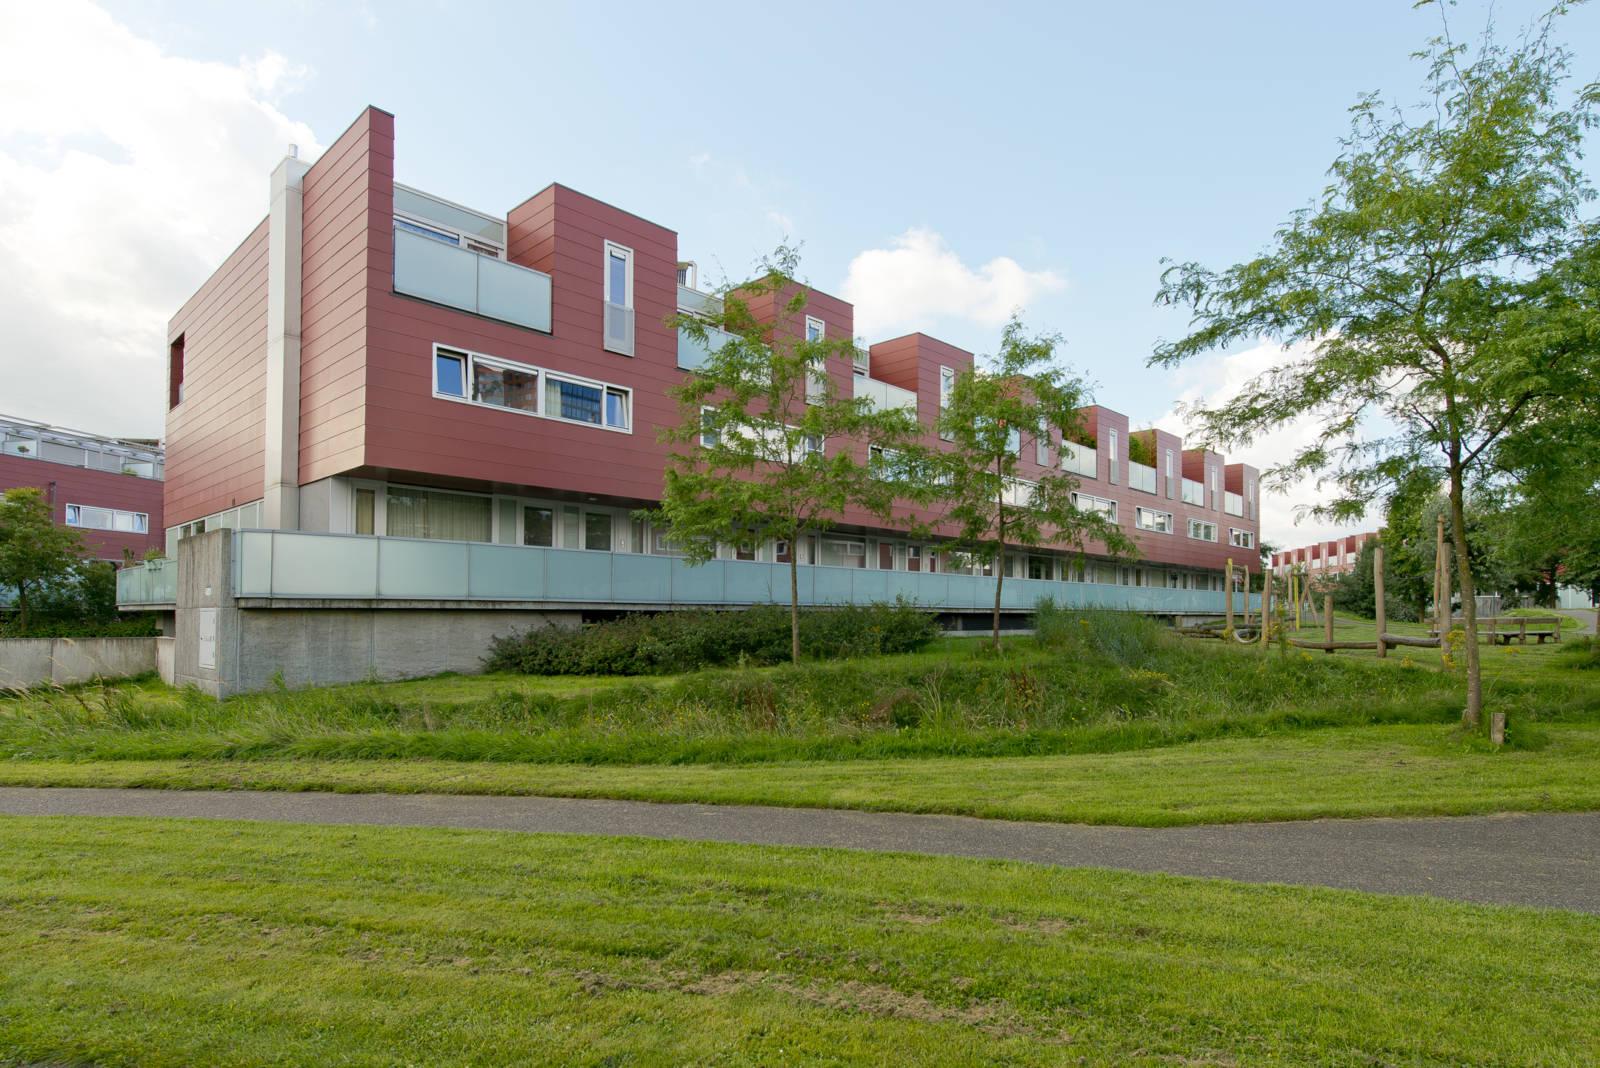 Huis kopen <Amersfoort> <Karper> <53>